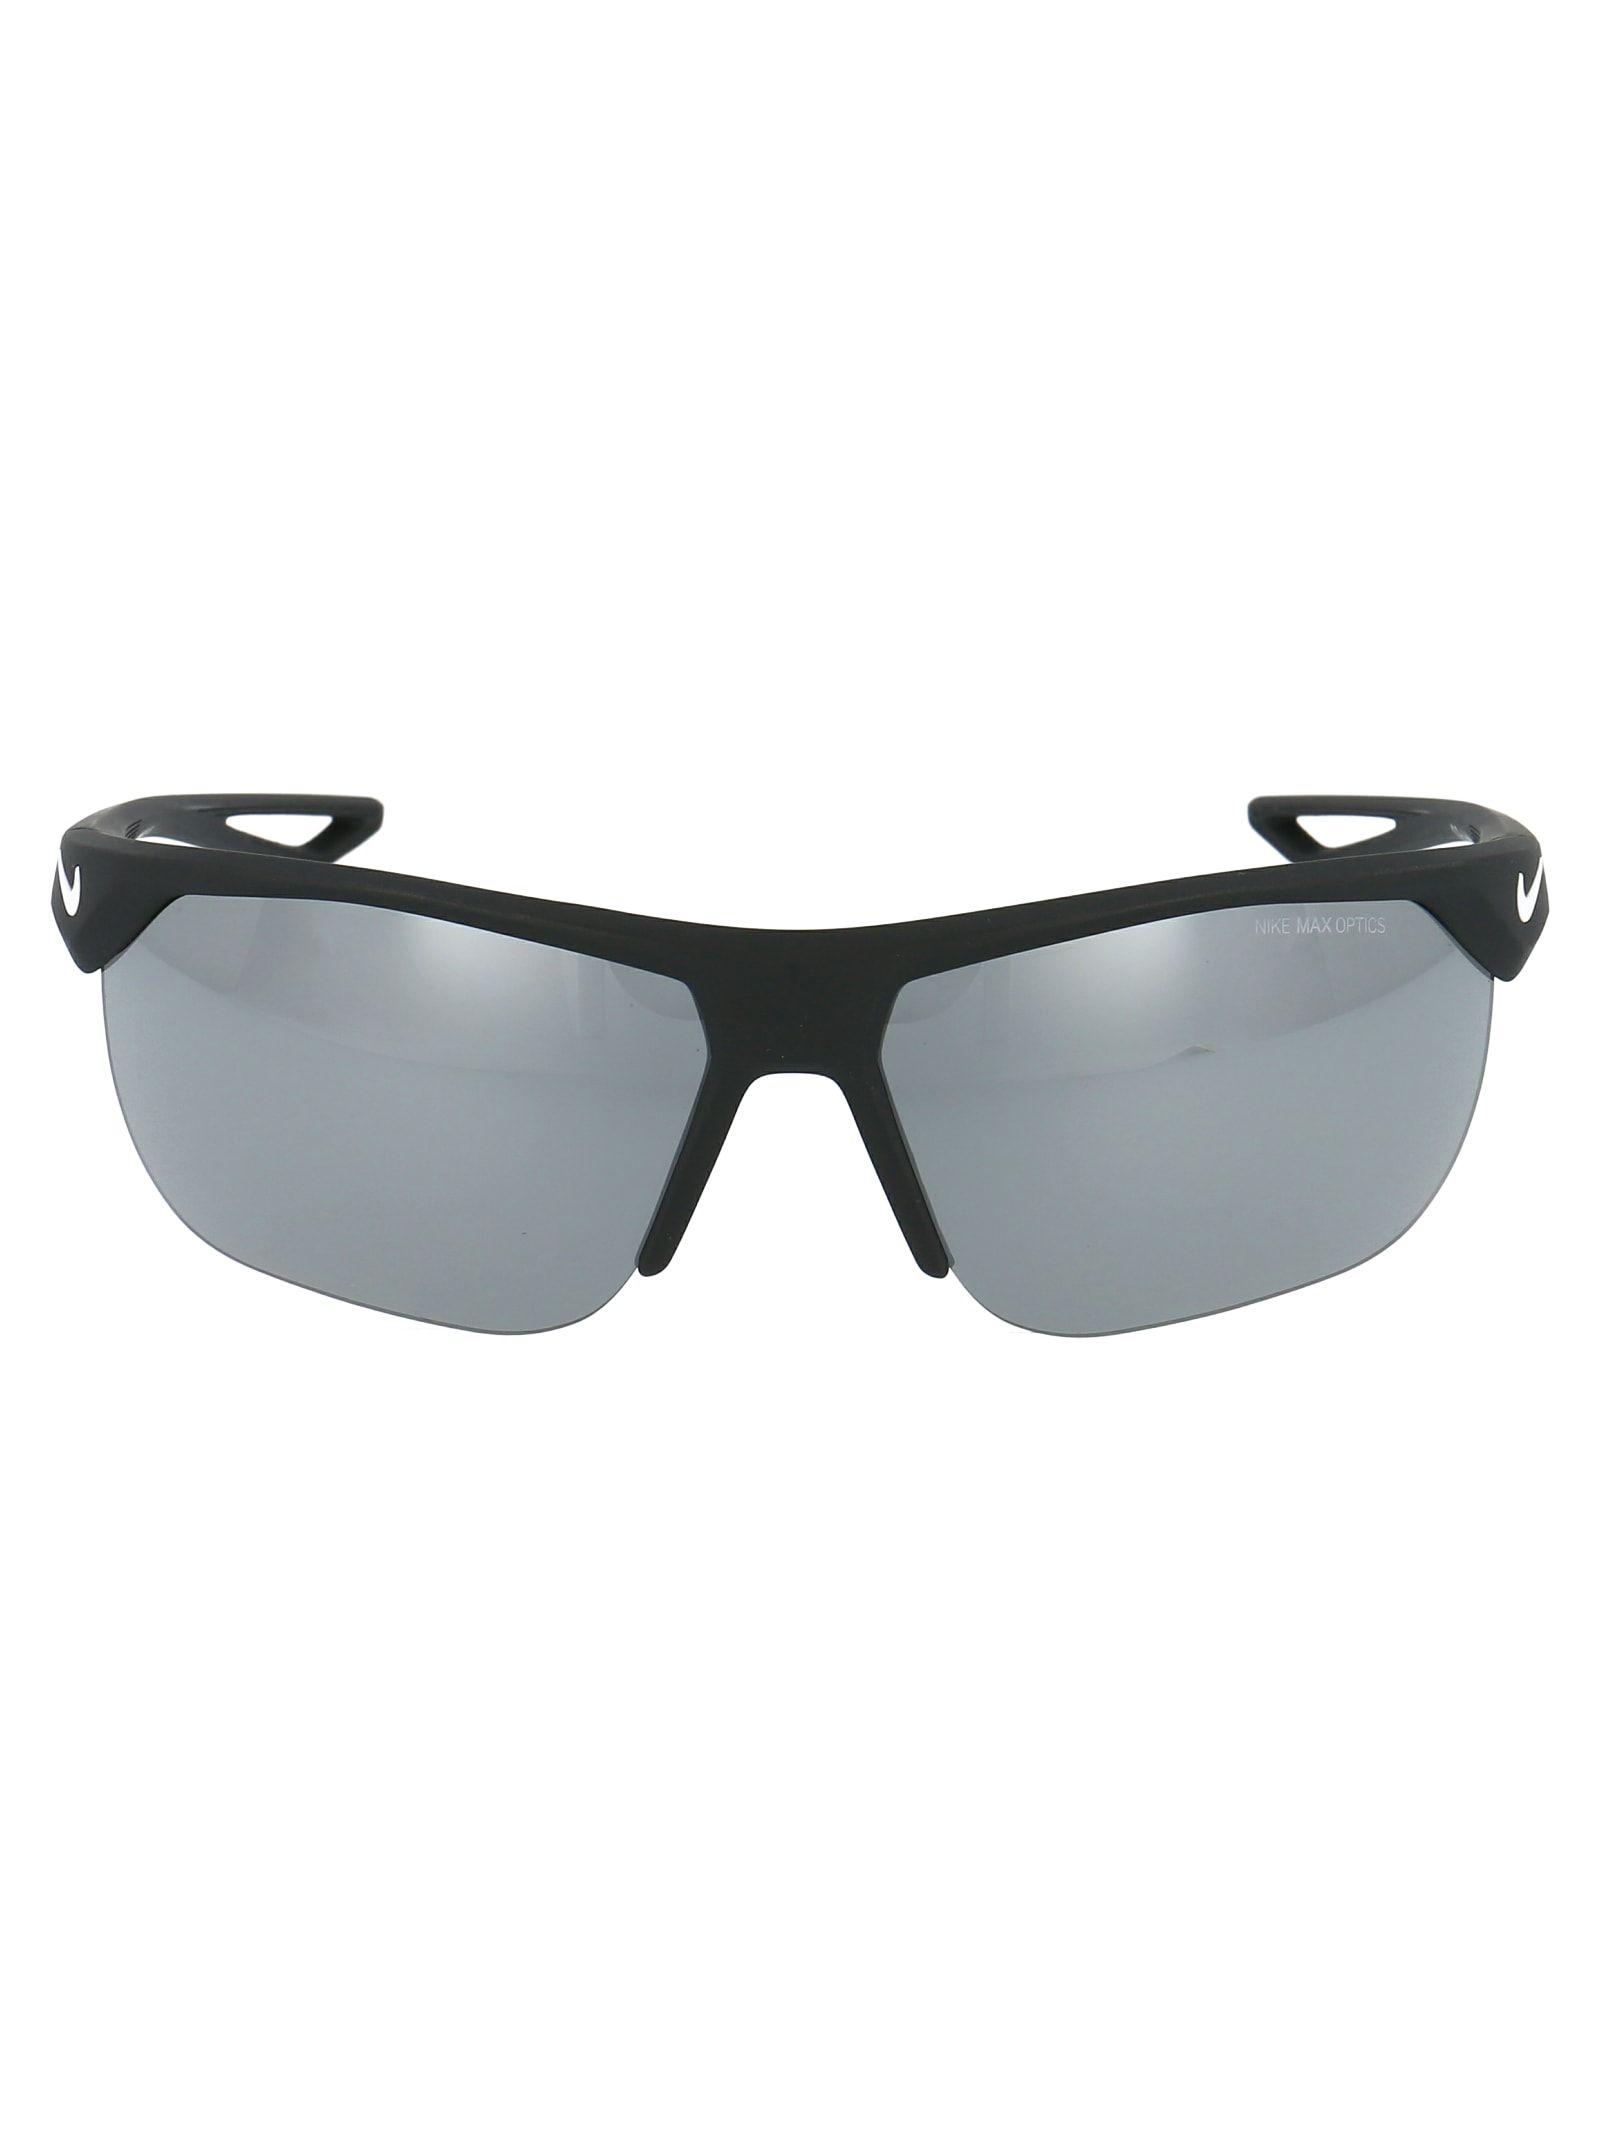 NIKE SUNGLASSES. nike Sunglasses, Nike accessories